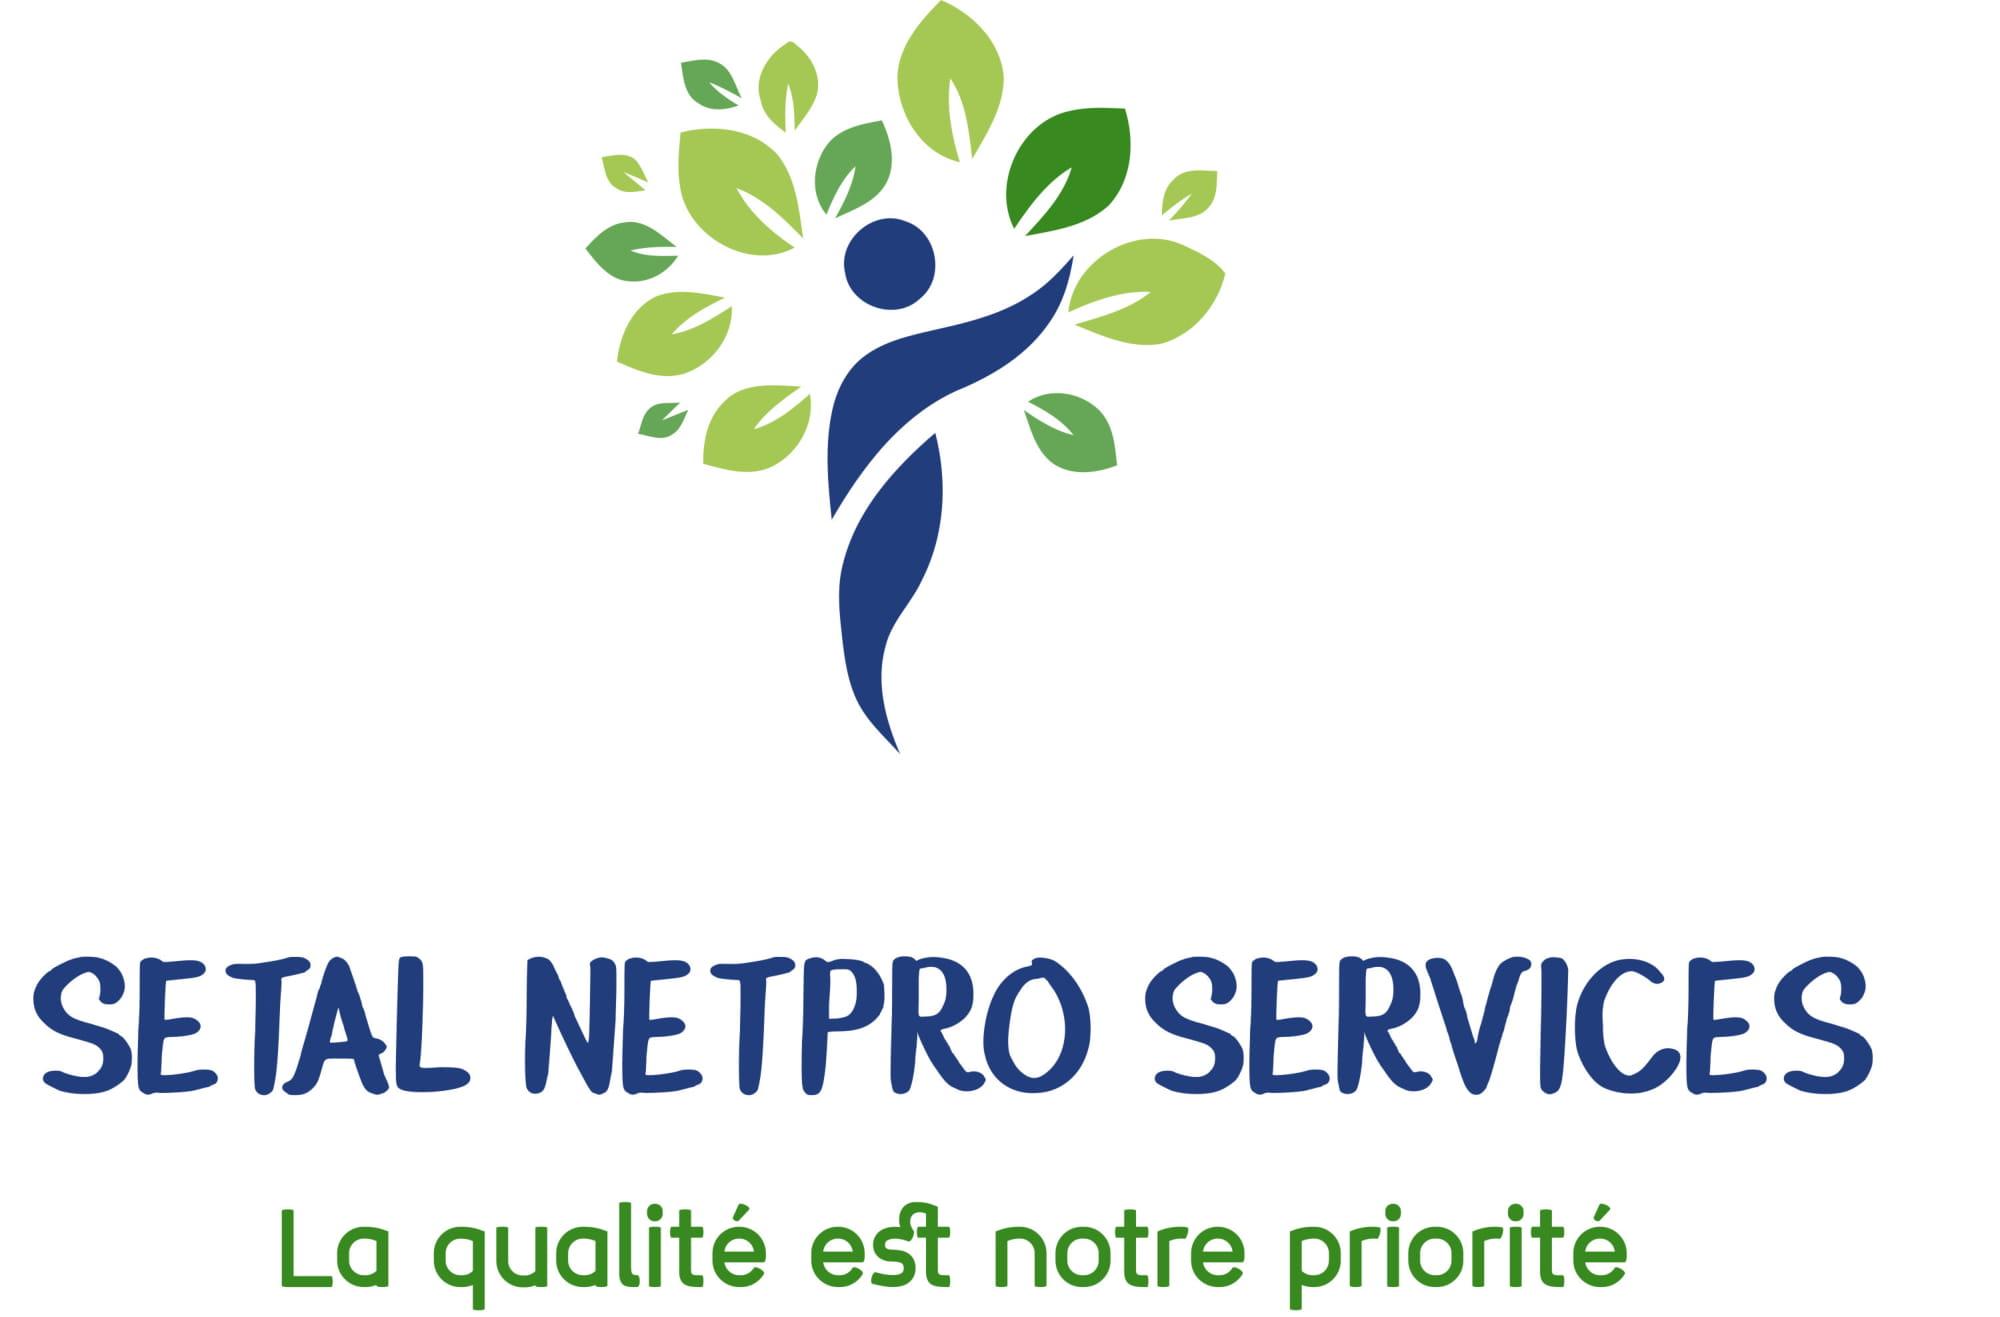 SETAL NETPRO SERVICES LOGO